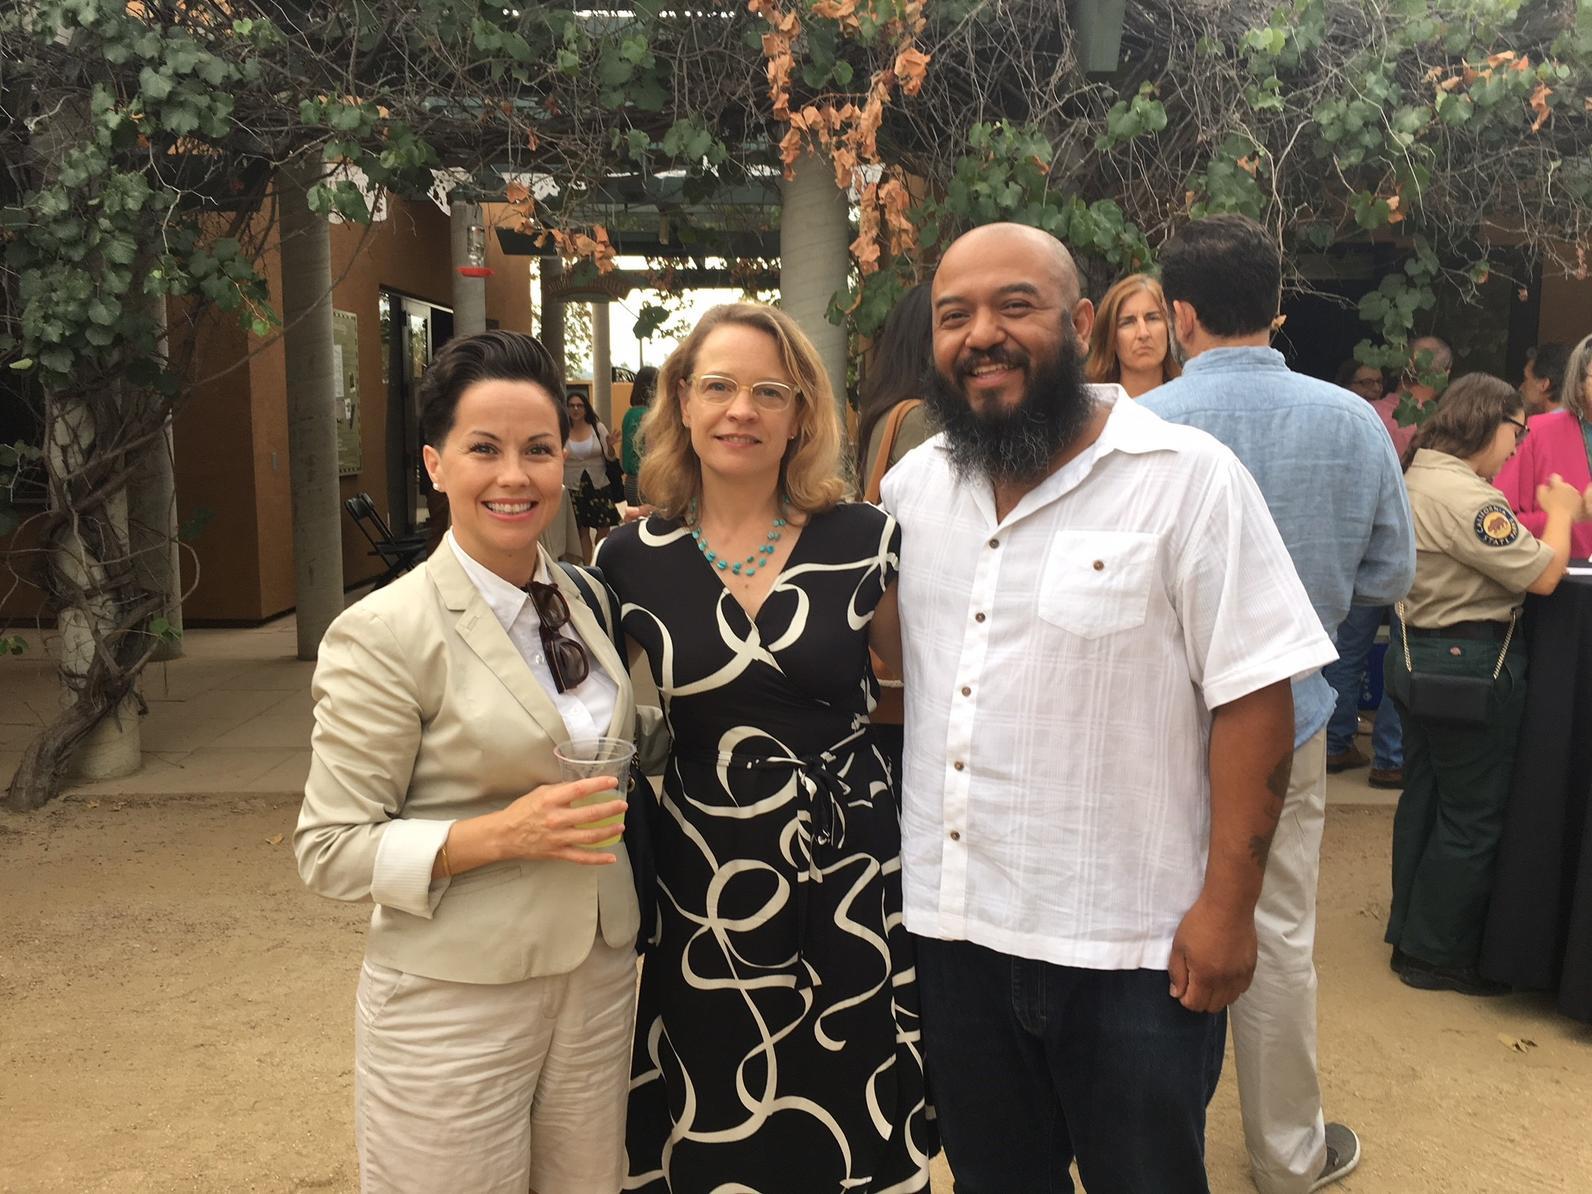 Viviana Franco (From Lot to Spot), Sarah Rose, and Marcos Trinidad